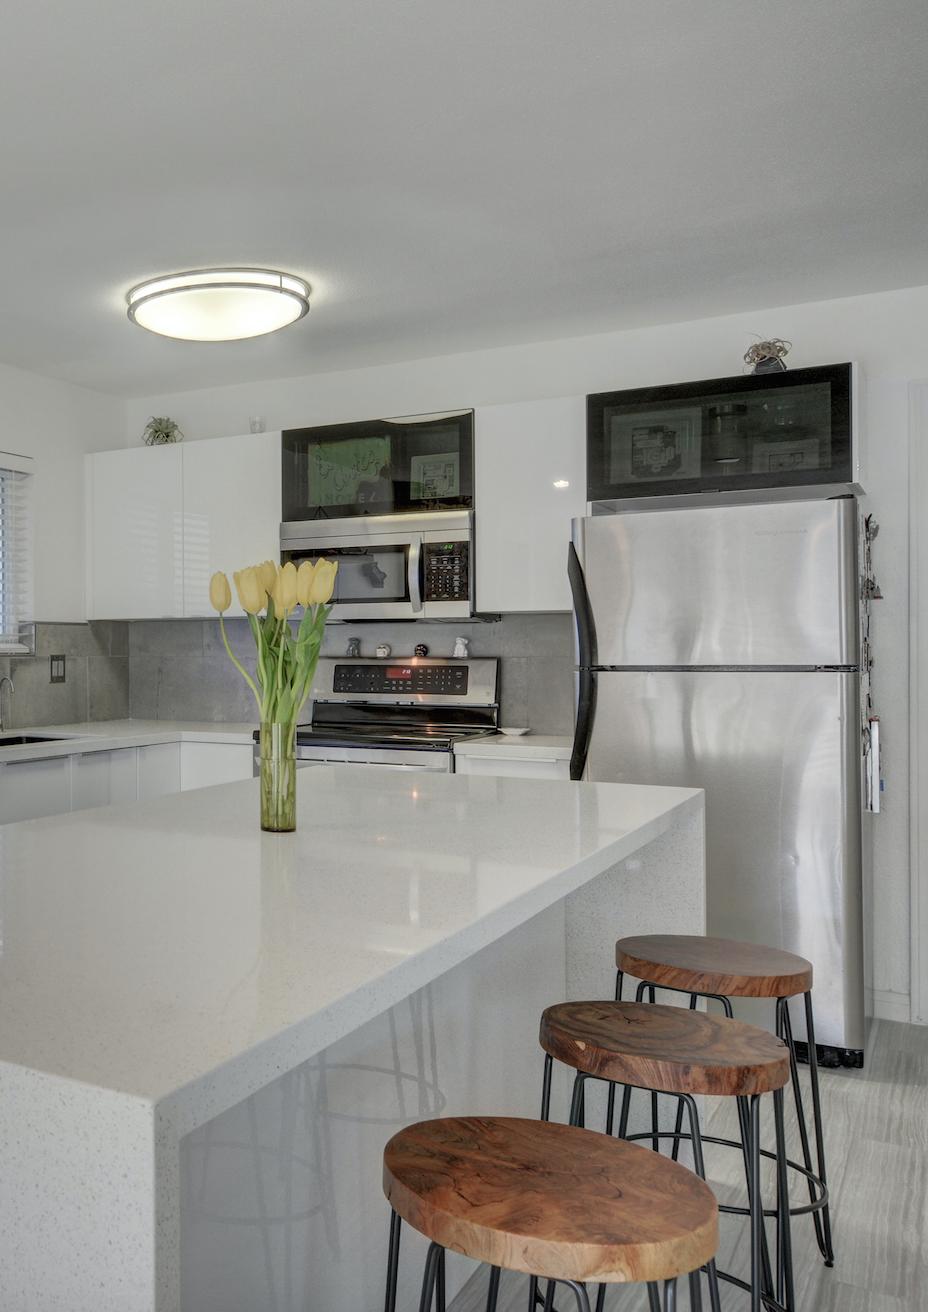 Simple yet stunning kitchendesign by Las Vegas